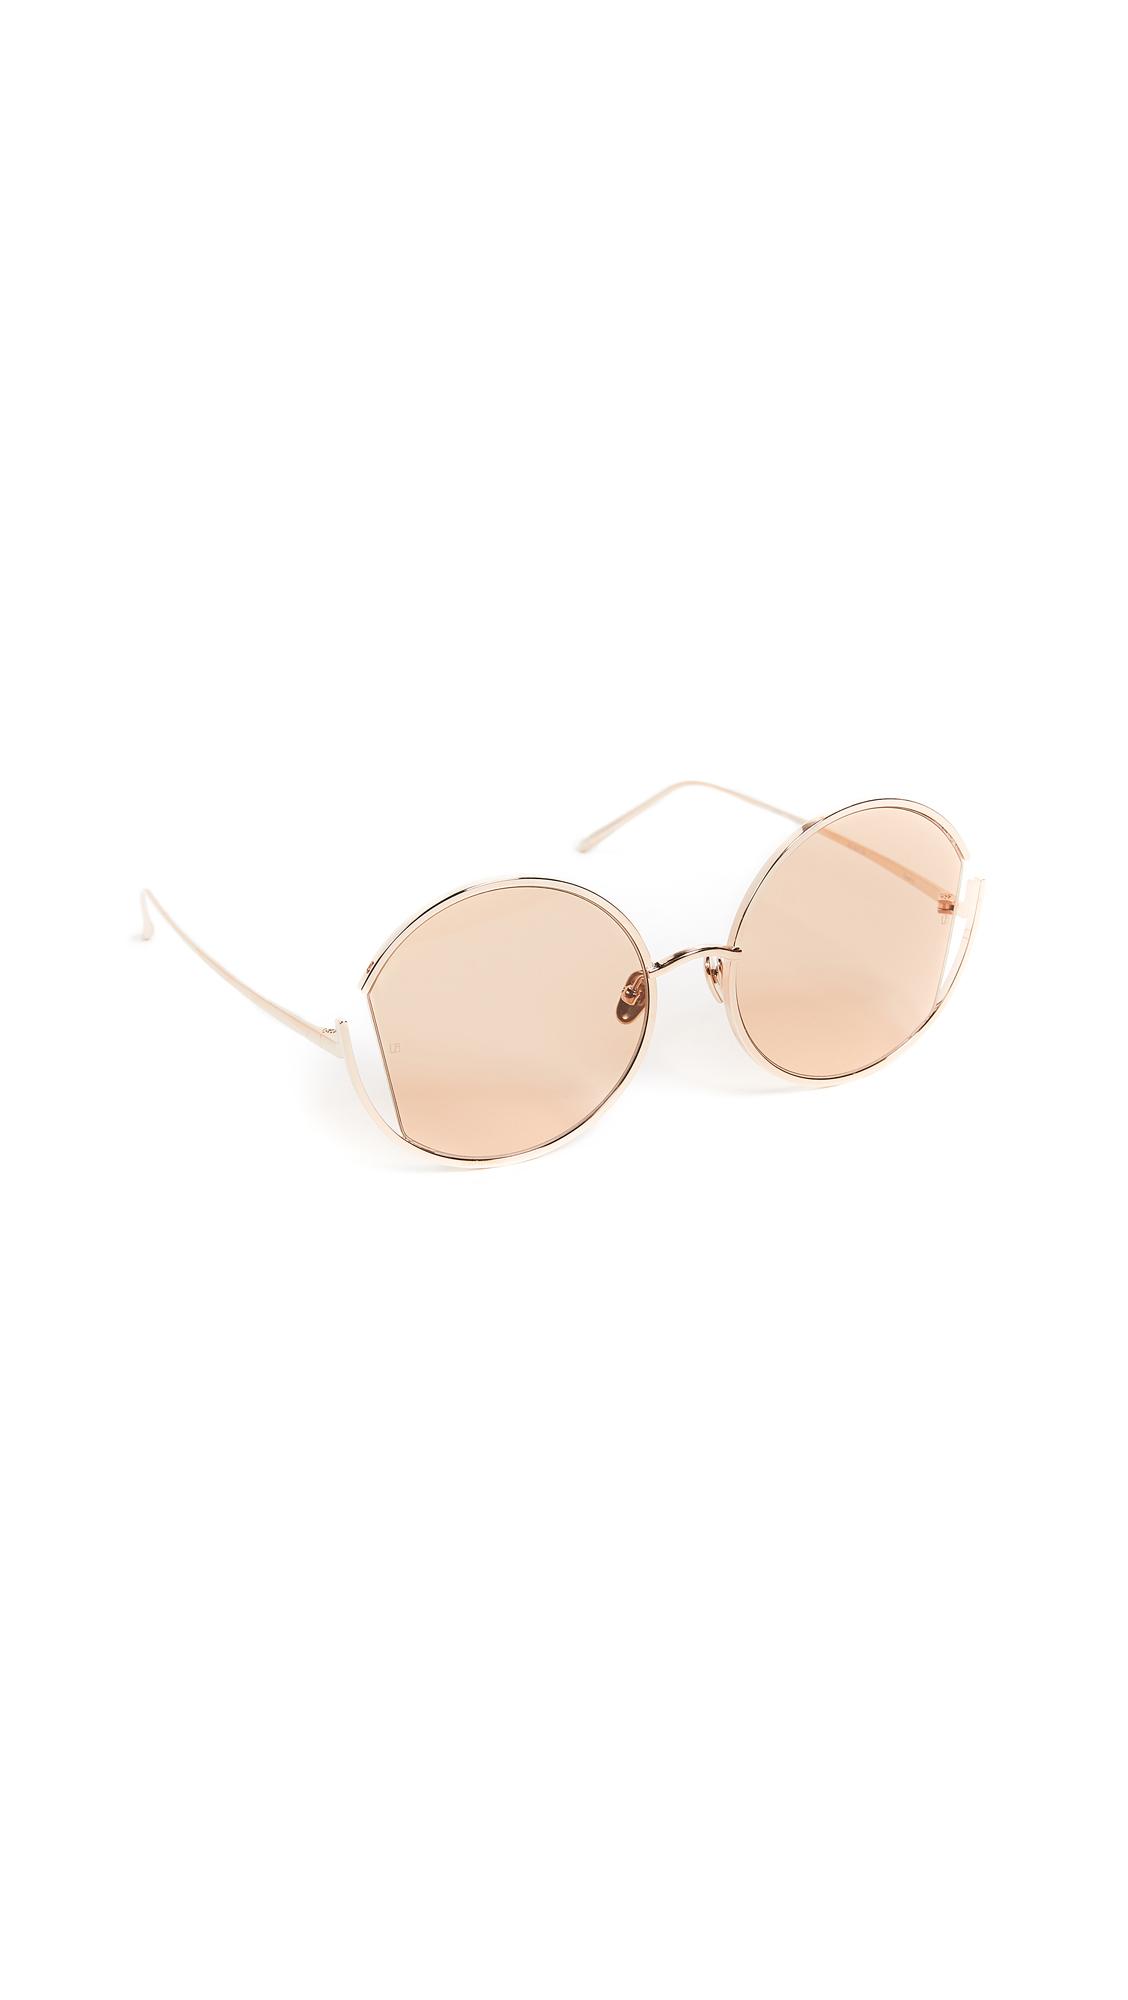 90341fdd43842 Linda Farrow Luxe Round Oversized Sunglasses In Rose Gold Peach ...